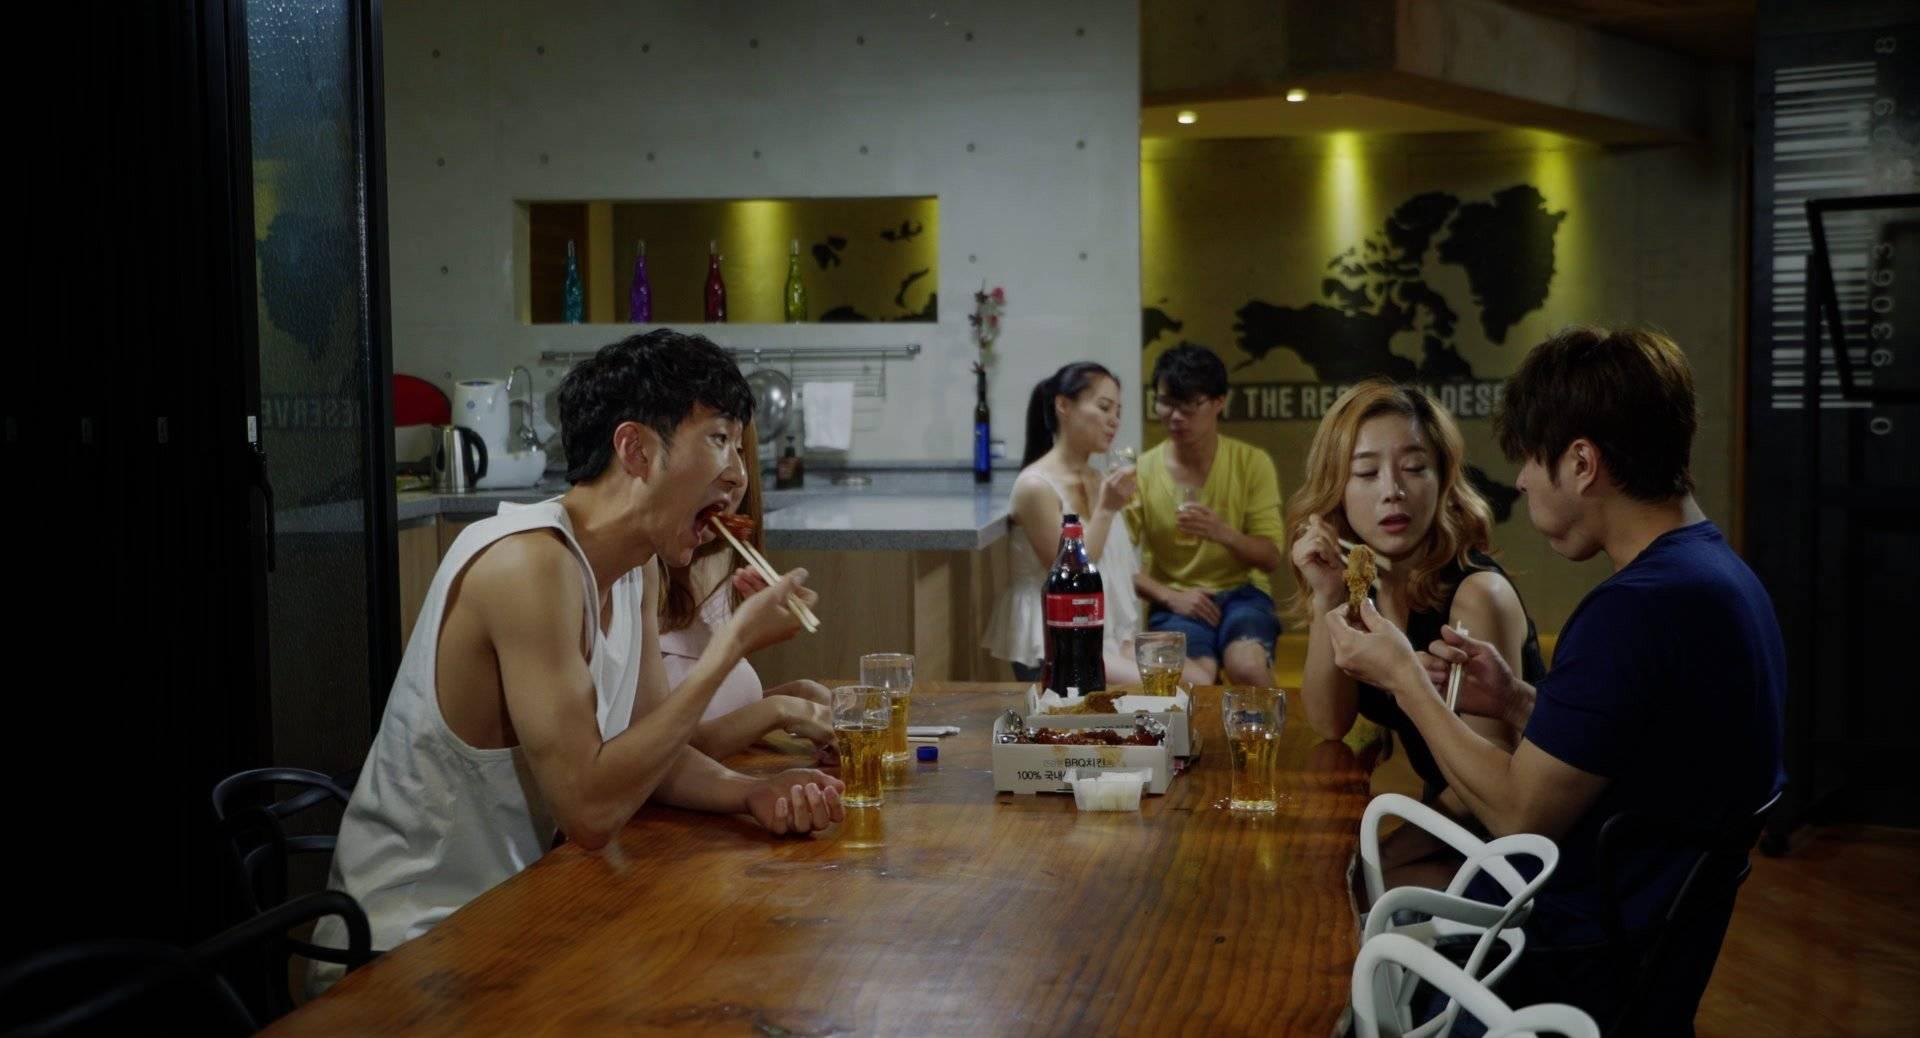 Mutual Relations 2015 trailer ~ 공즉시색 ~ Kim Hwa-yeon, Ji Eun-seo, Park Cho